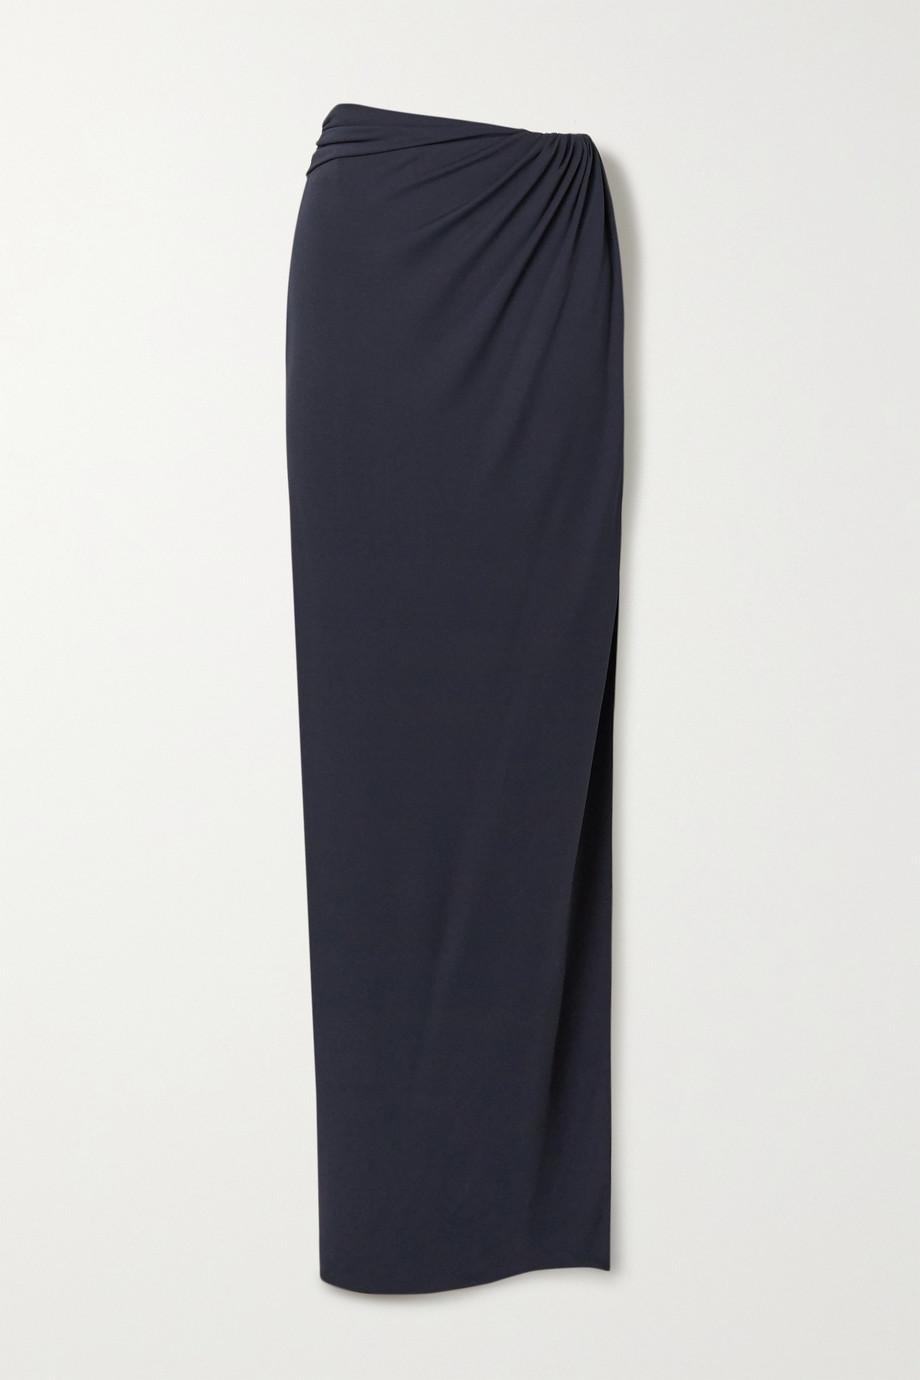 Brandon Maxwell Wrap-effect gathered jersey maxi skirt